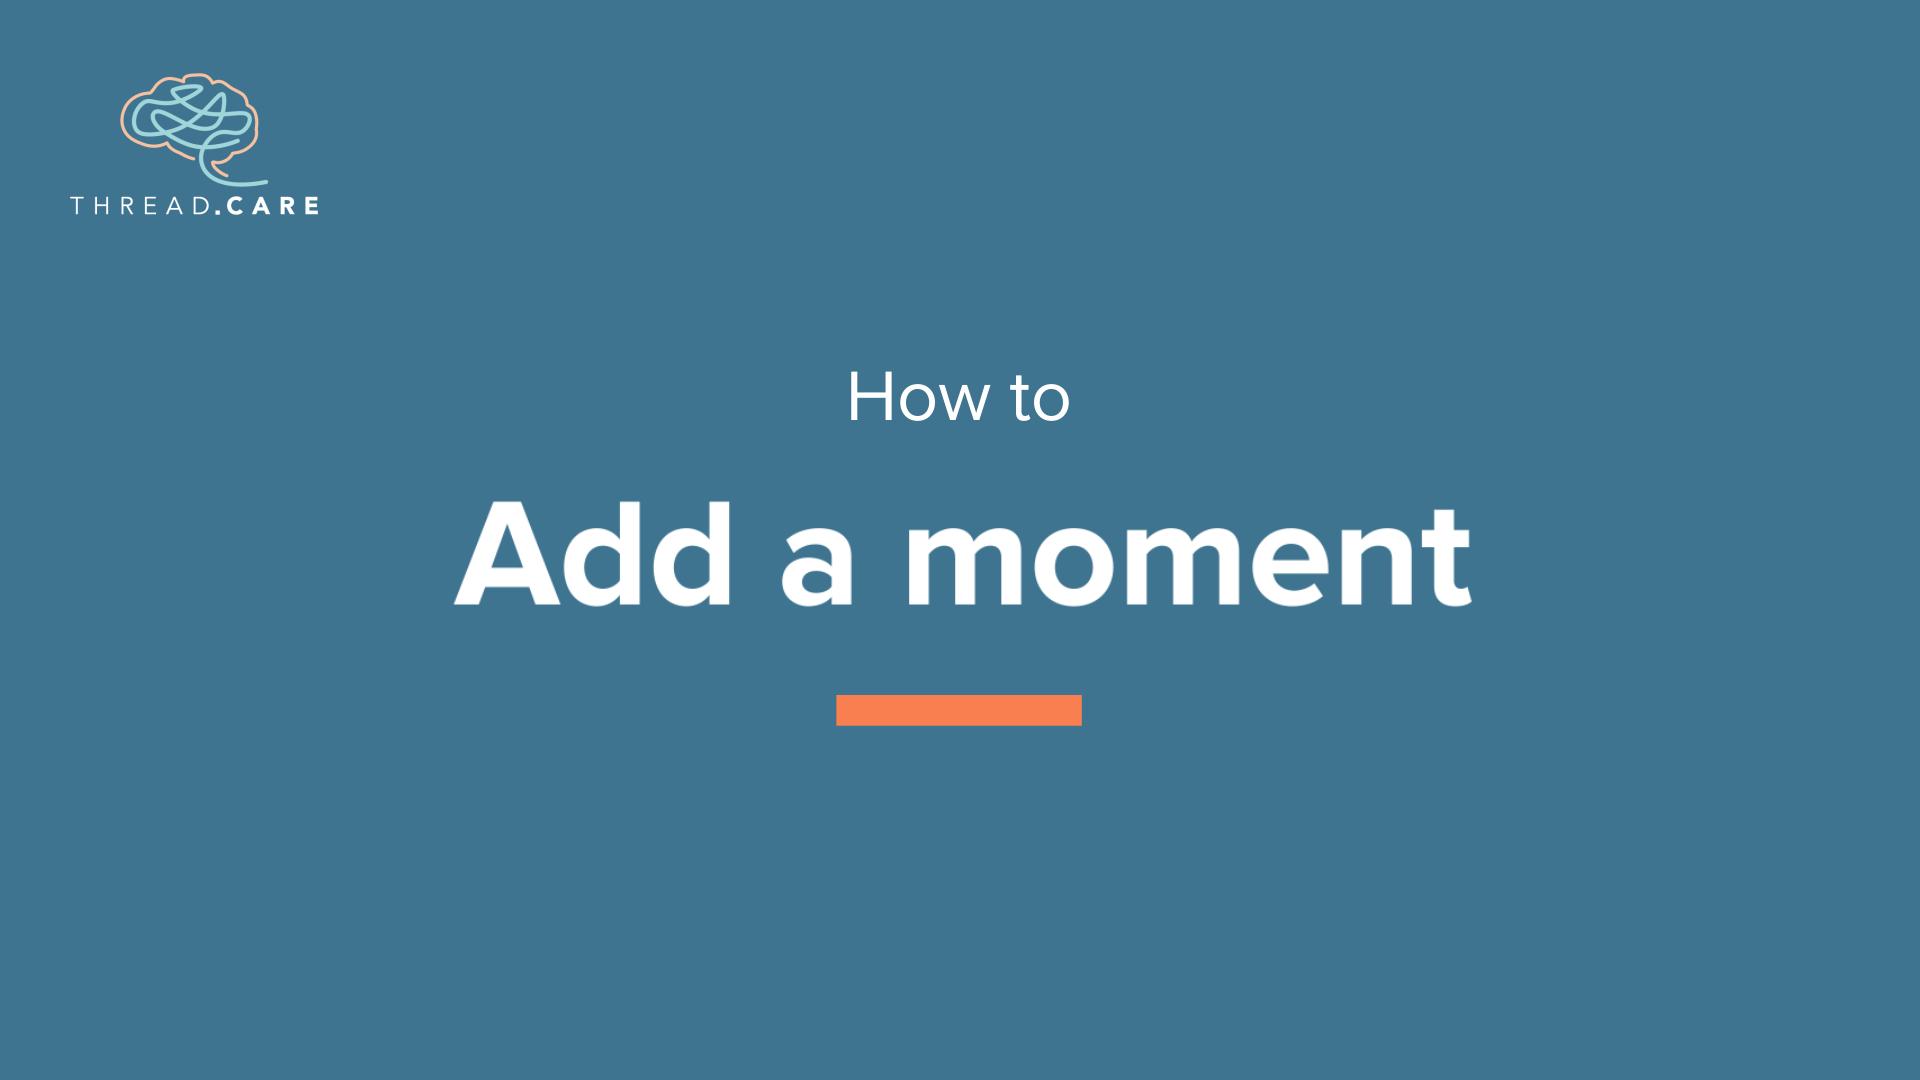 Add a Moment